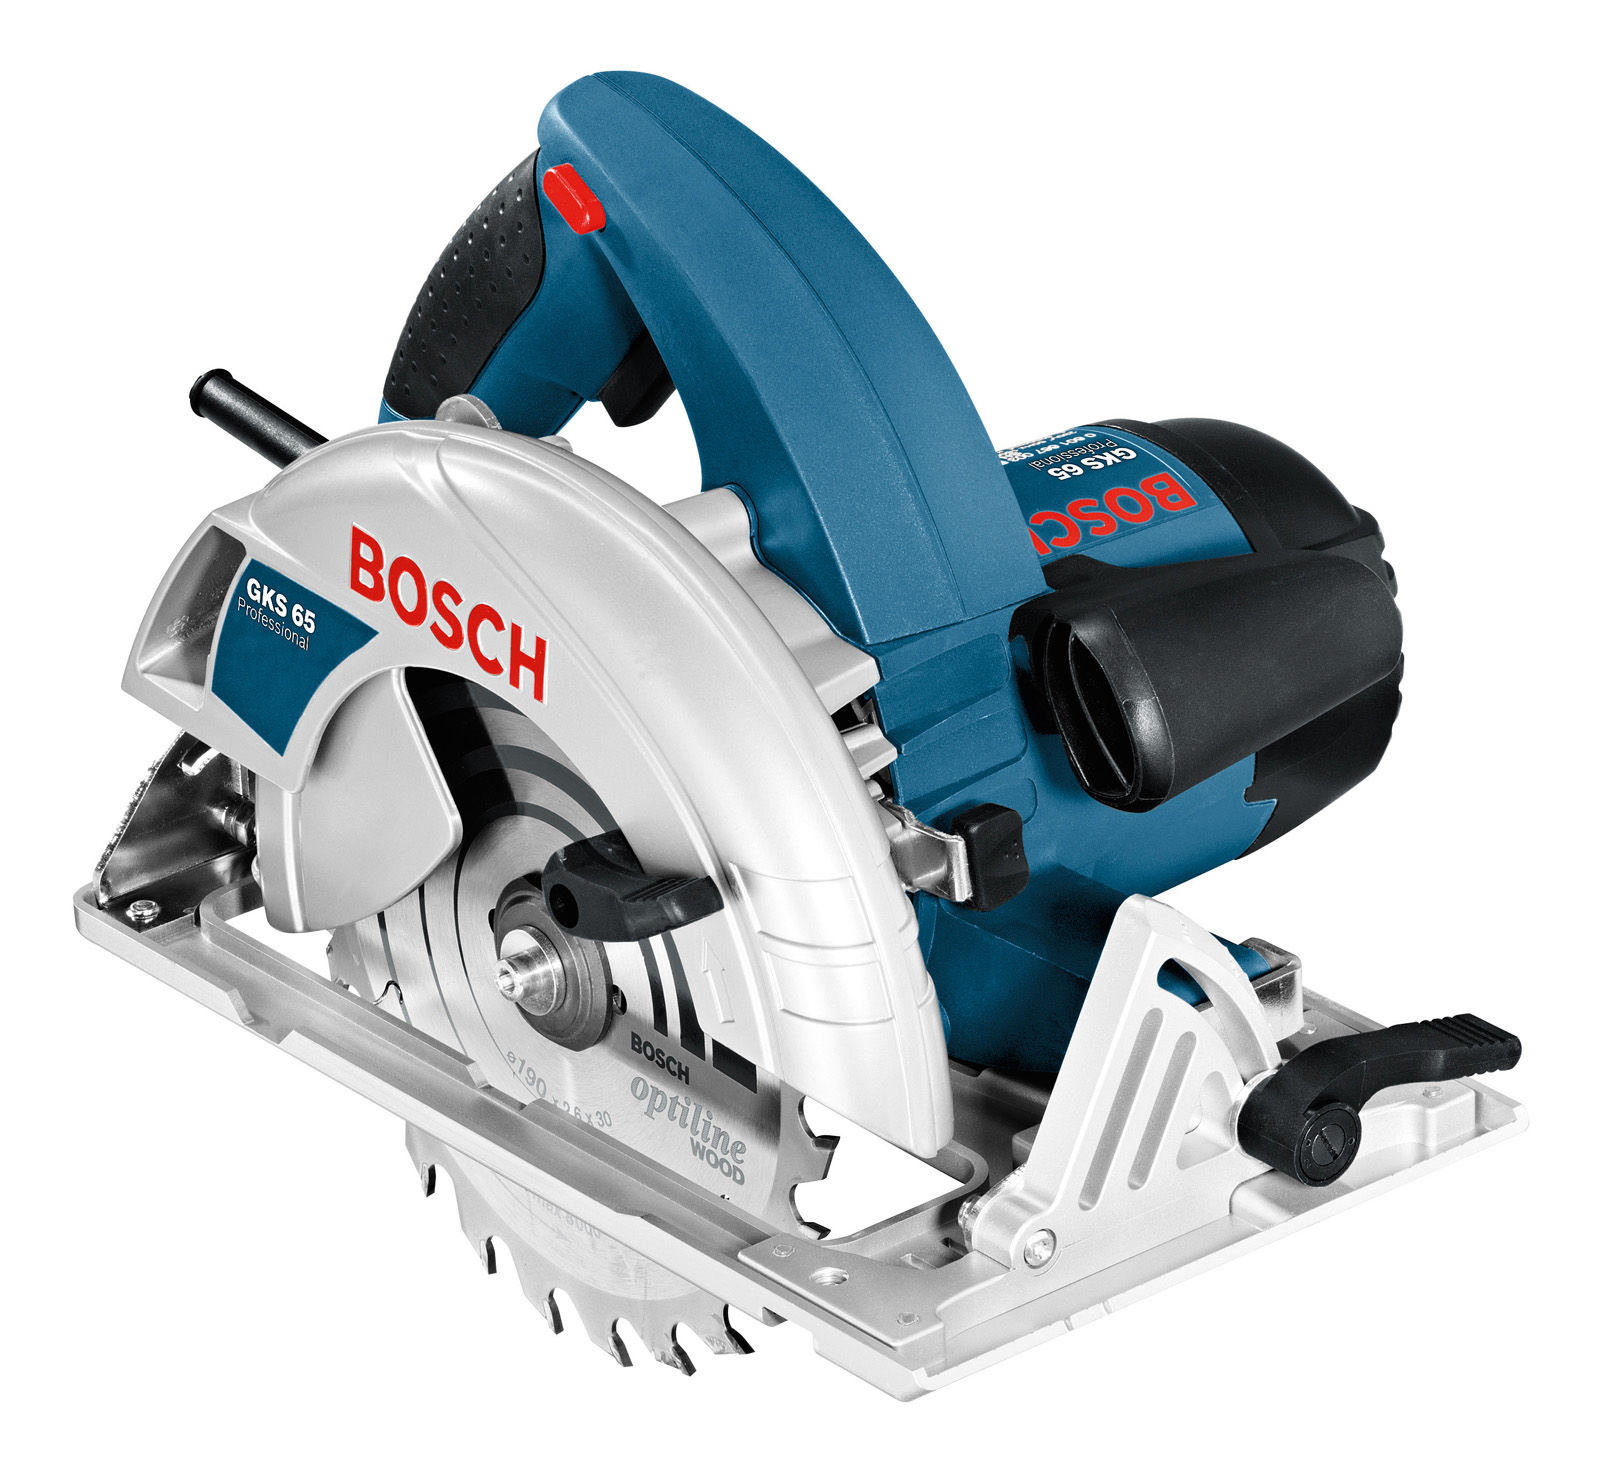 Пила циркулярная Bosch Gks 65